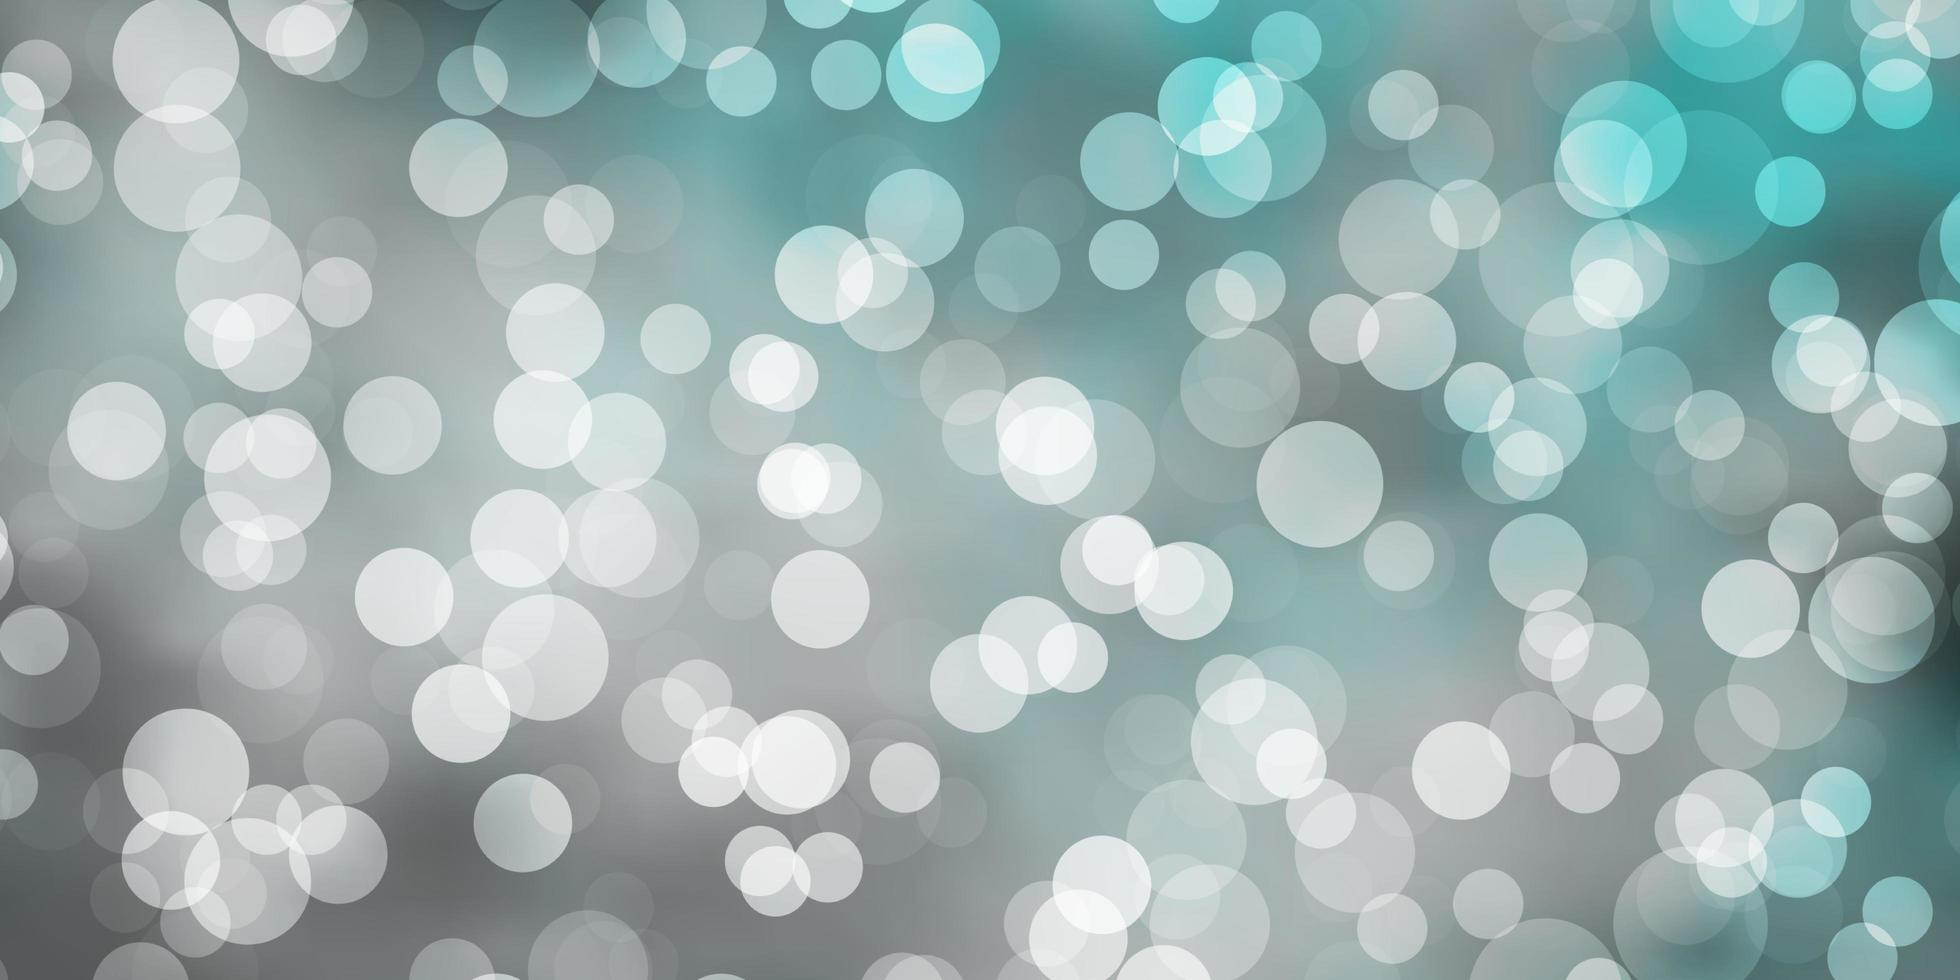 lichtblauwe vector achtergrond met cirkels.